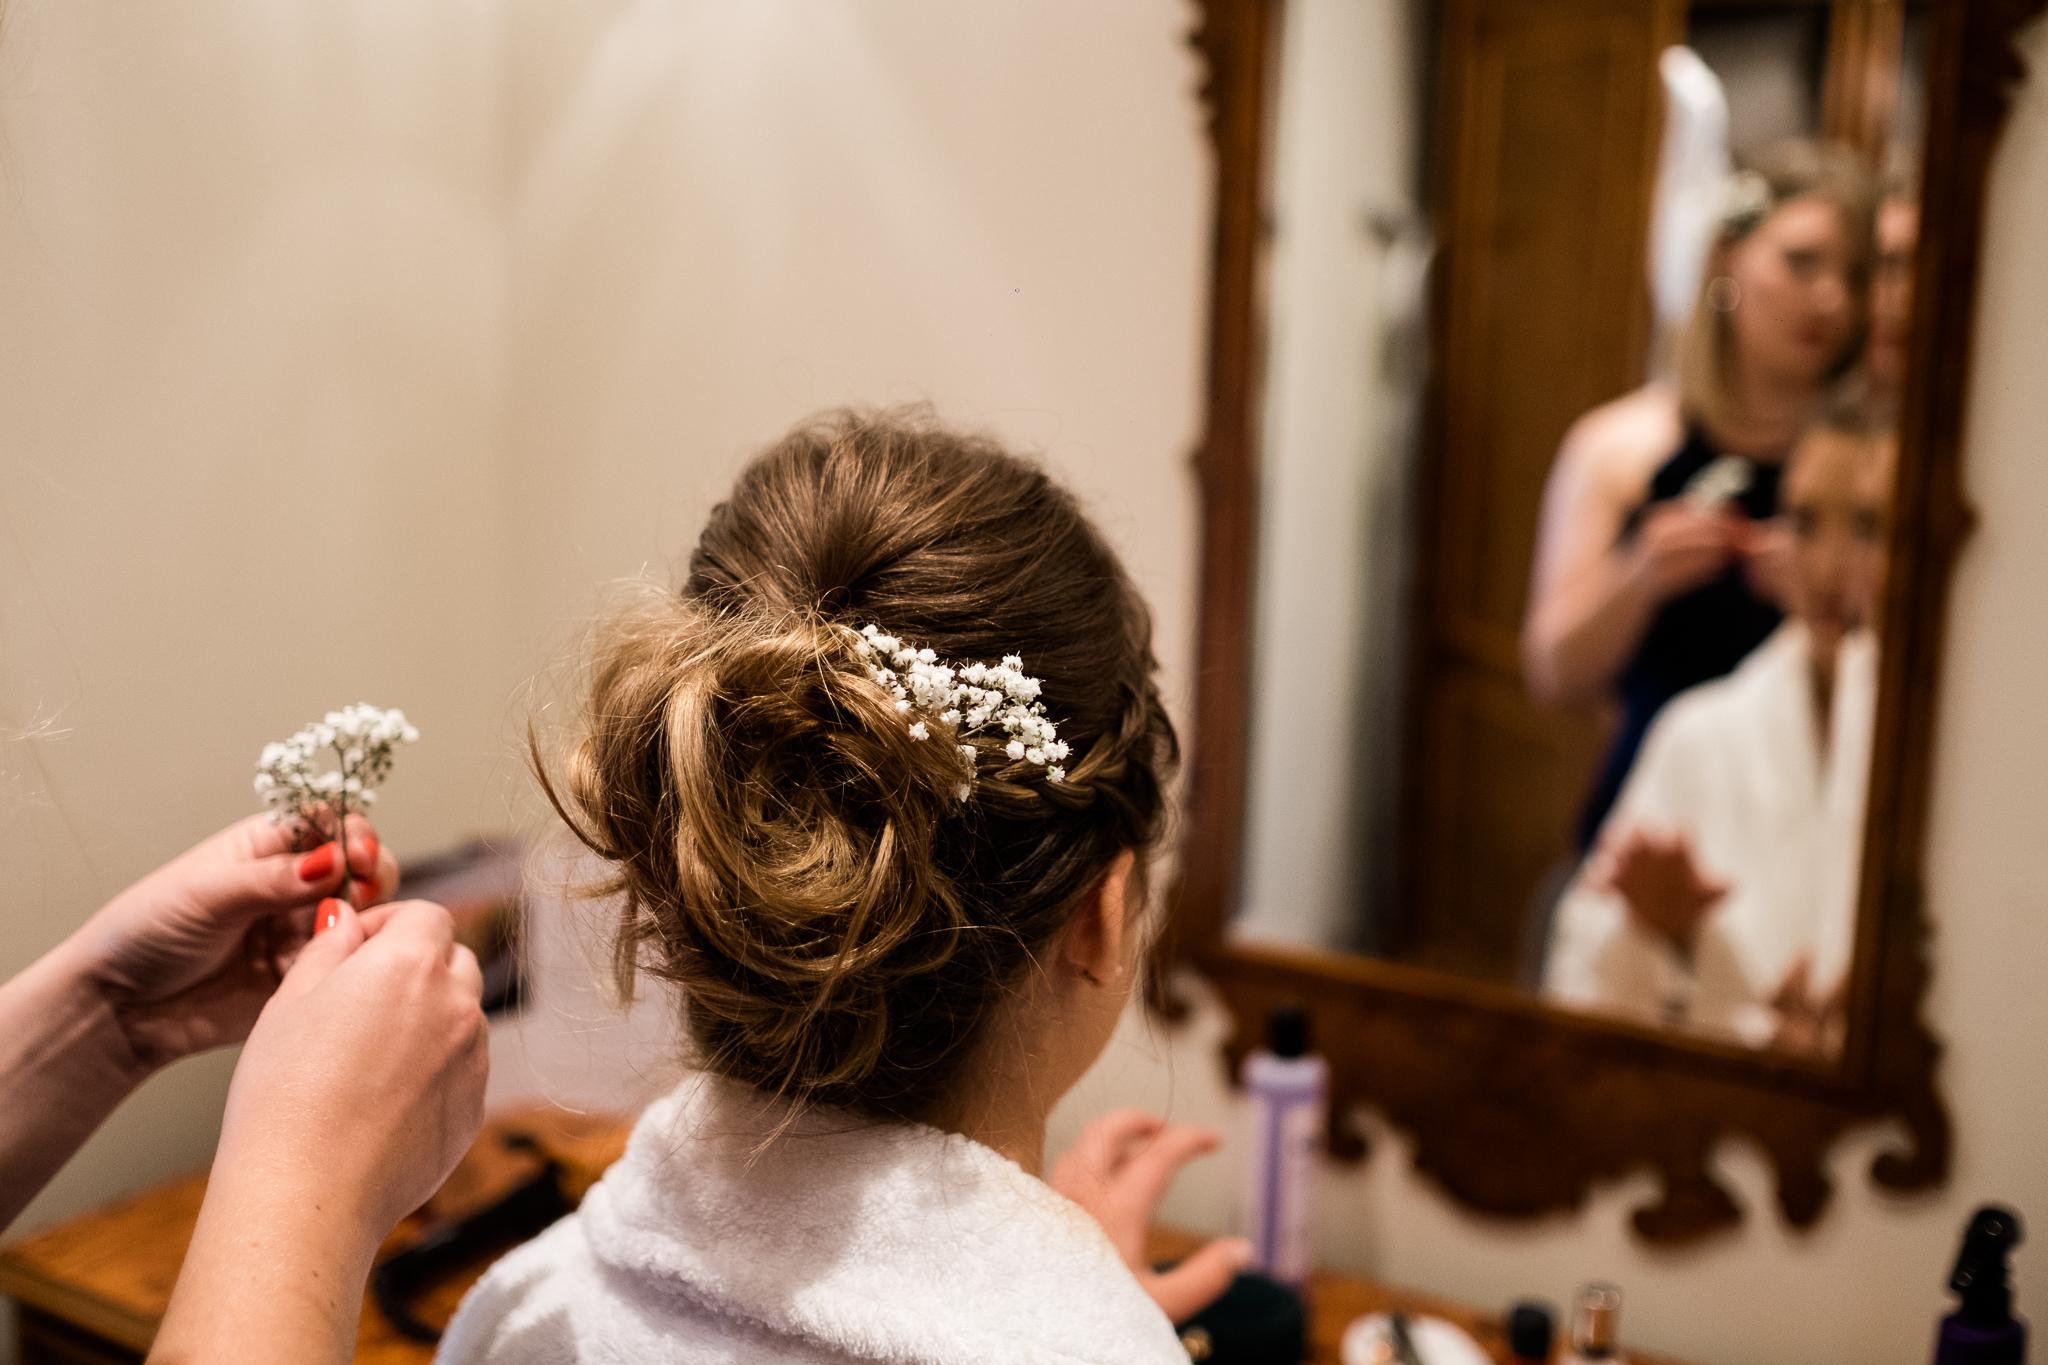 Relaxed Documentary Wedding Photography at The Wizard Inn, Alderley Edge Cheshire - Jenny Harper-7.jpg